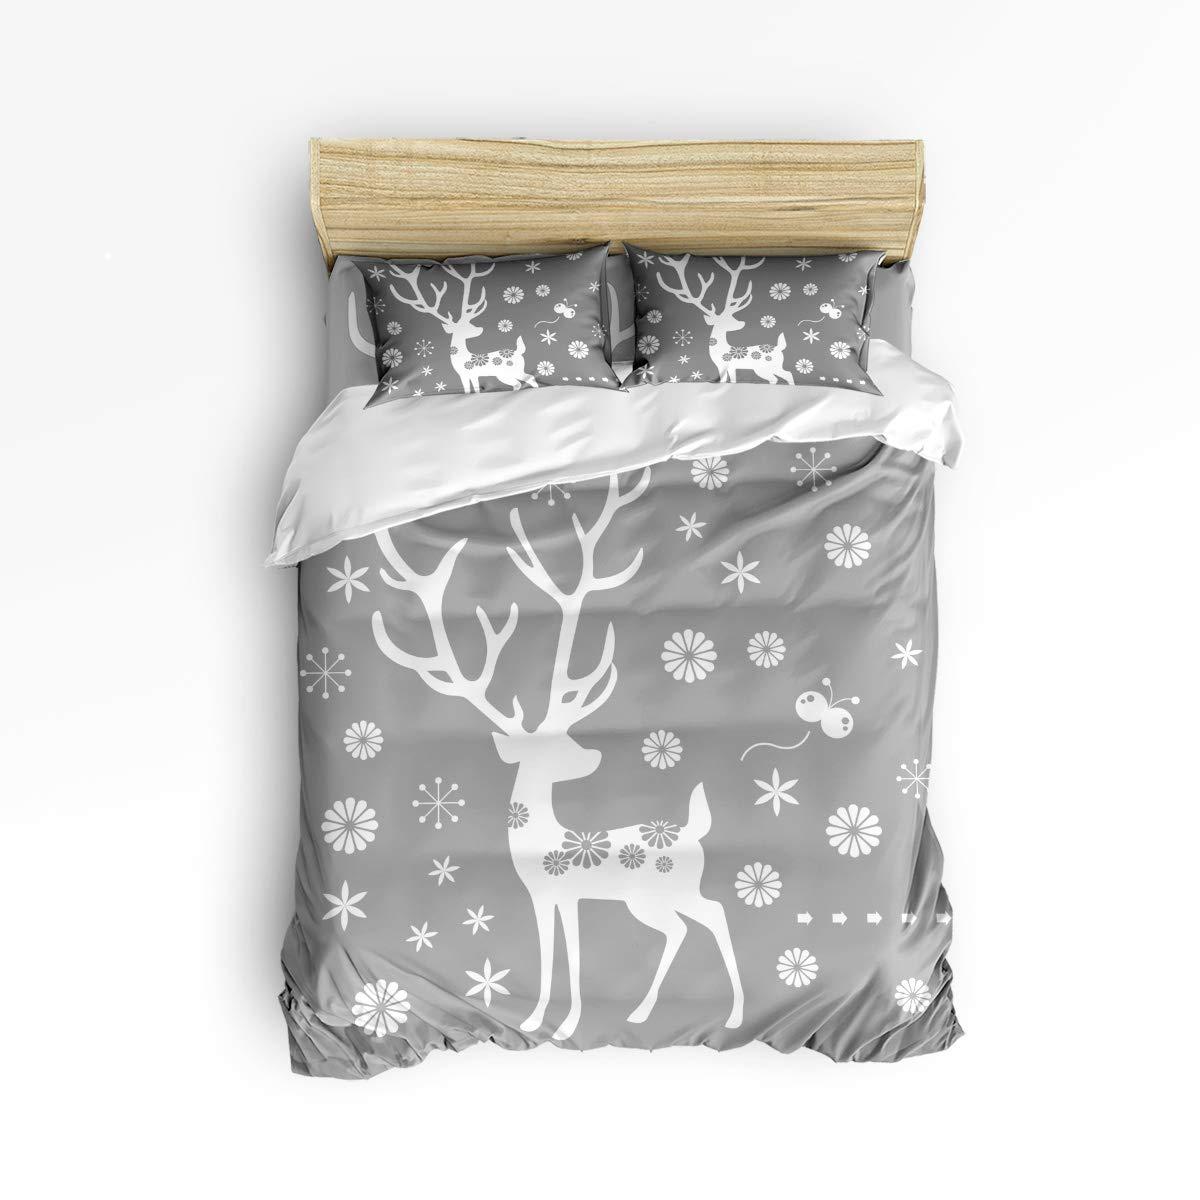 BMALL 羽毛布団カバーセット 美しい風景 ソフト スタイリッシュ ホームインテリア 掛け布団カバーセット King Size 20181115LCZBMALLSJTSLSZ00369SJTDBML B07KKHDQSW Merry Christmas72bml6045 King Size